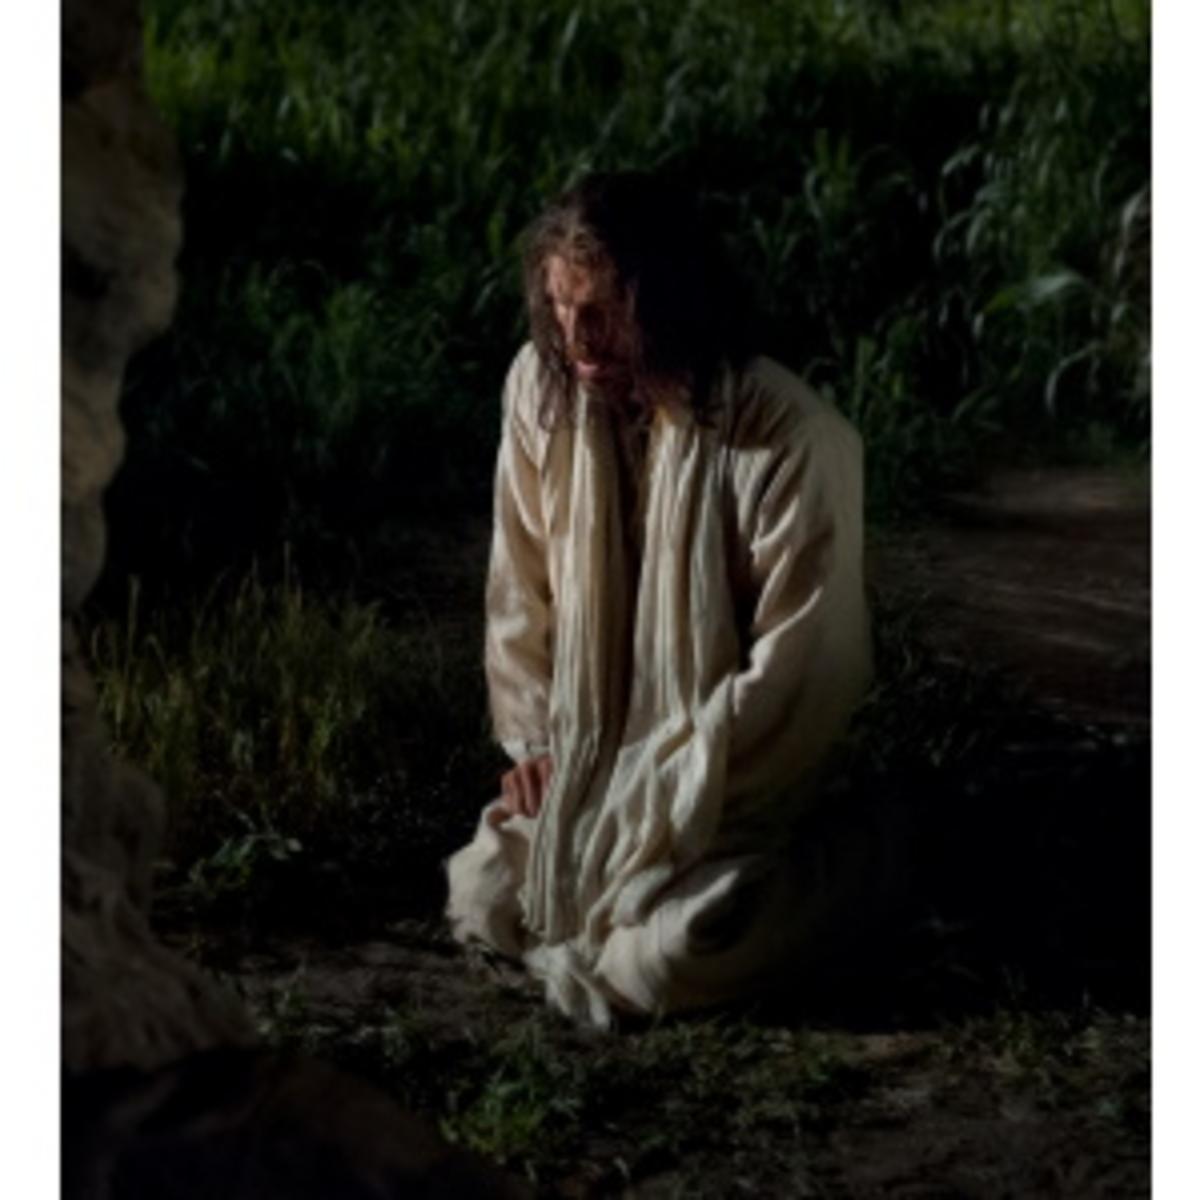 Jesus' agony in garden